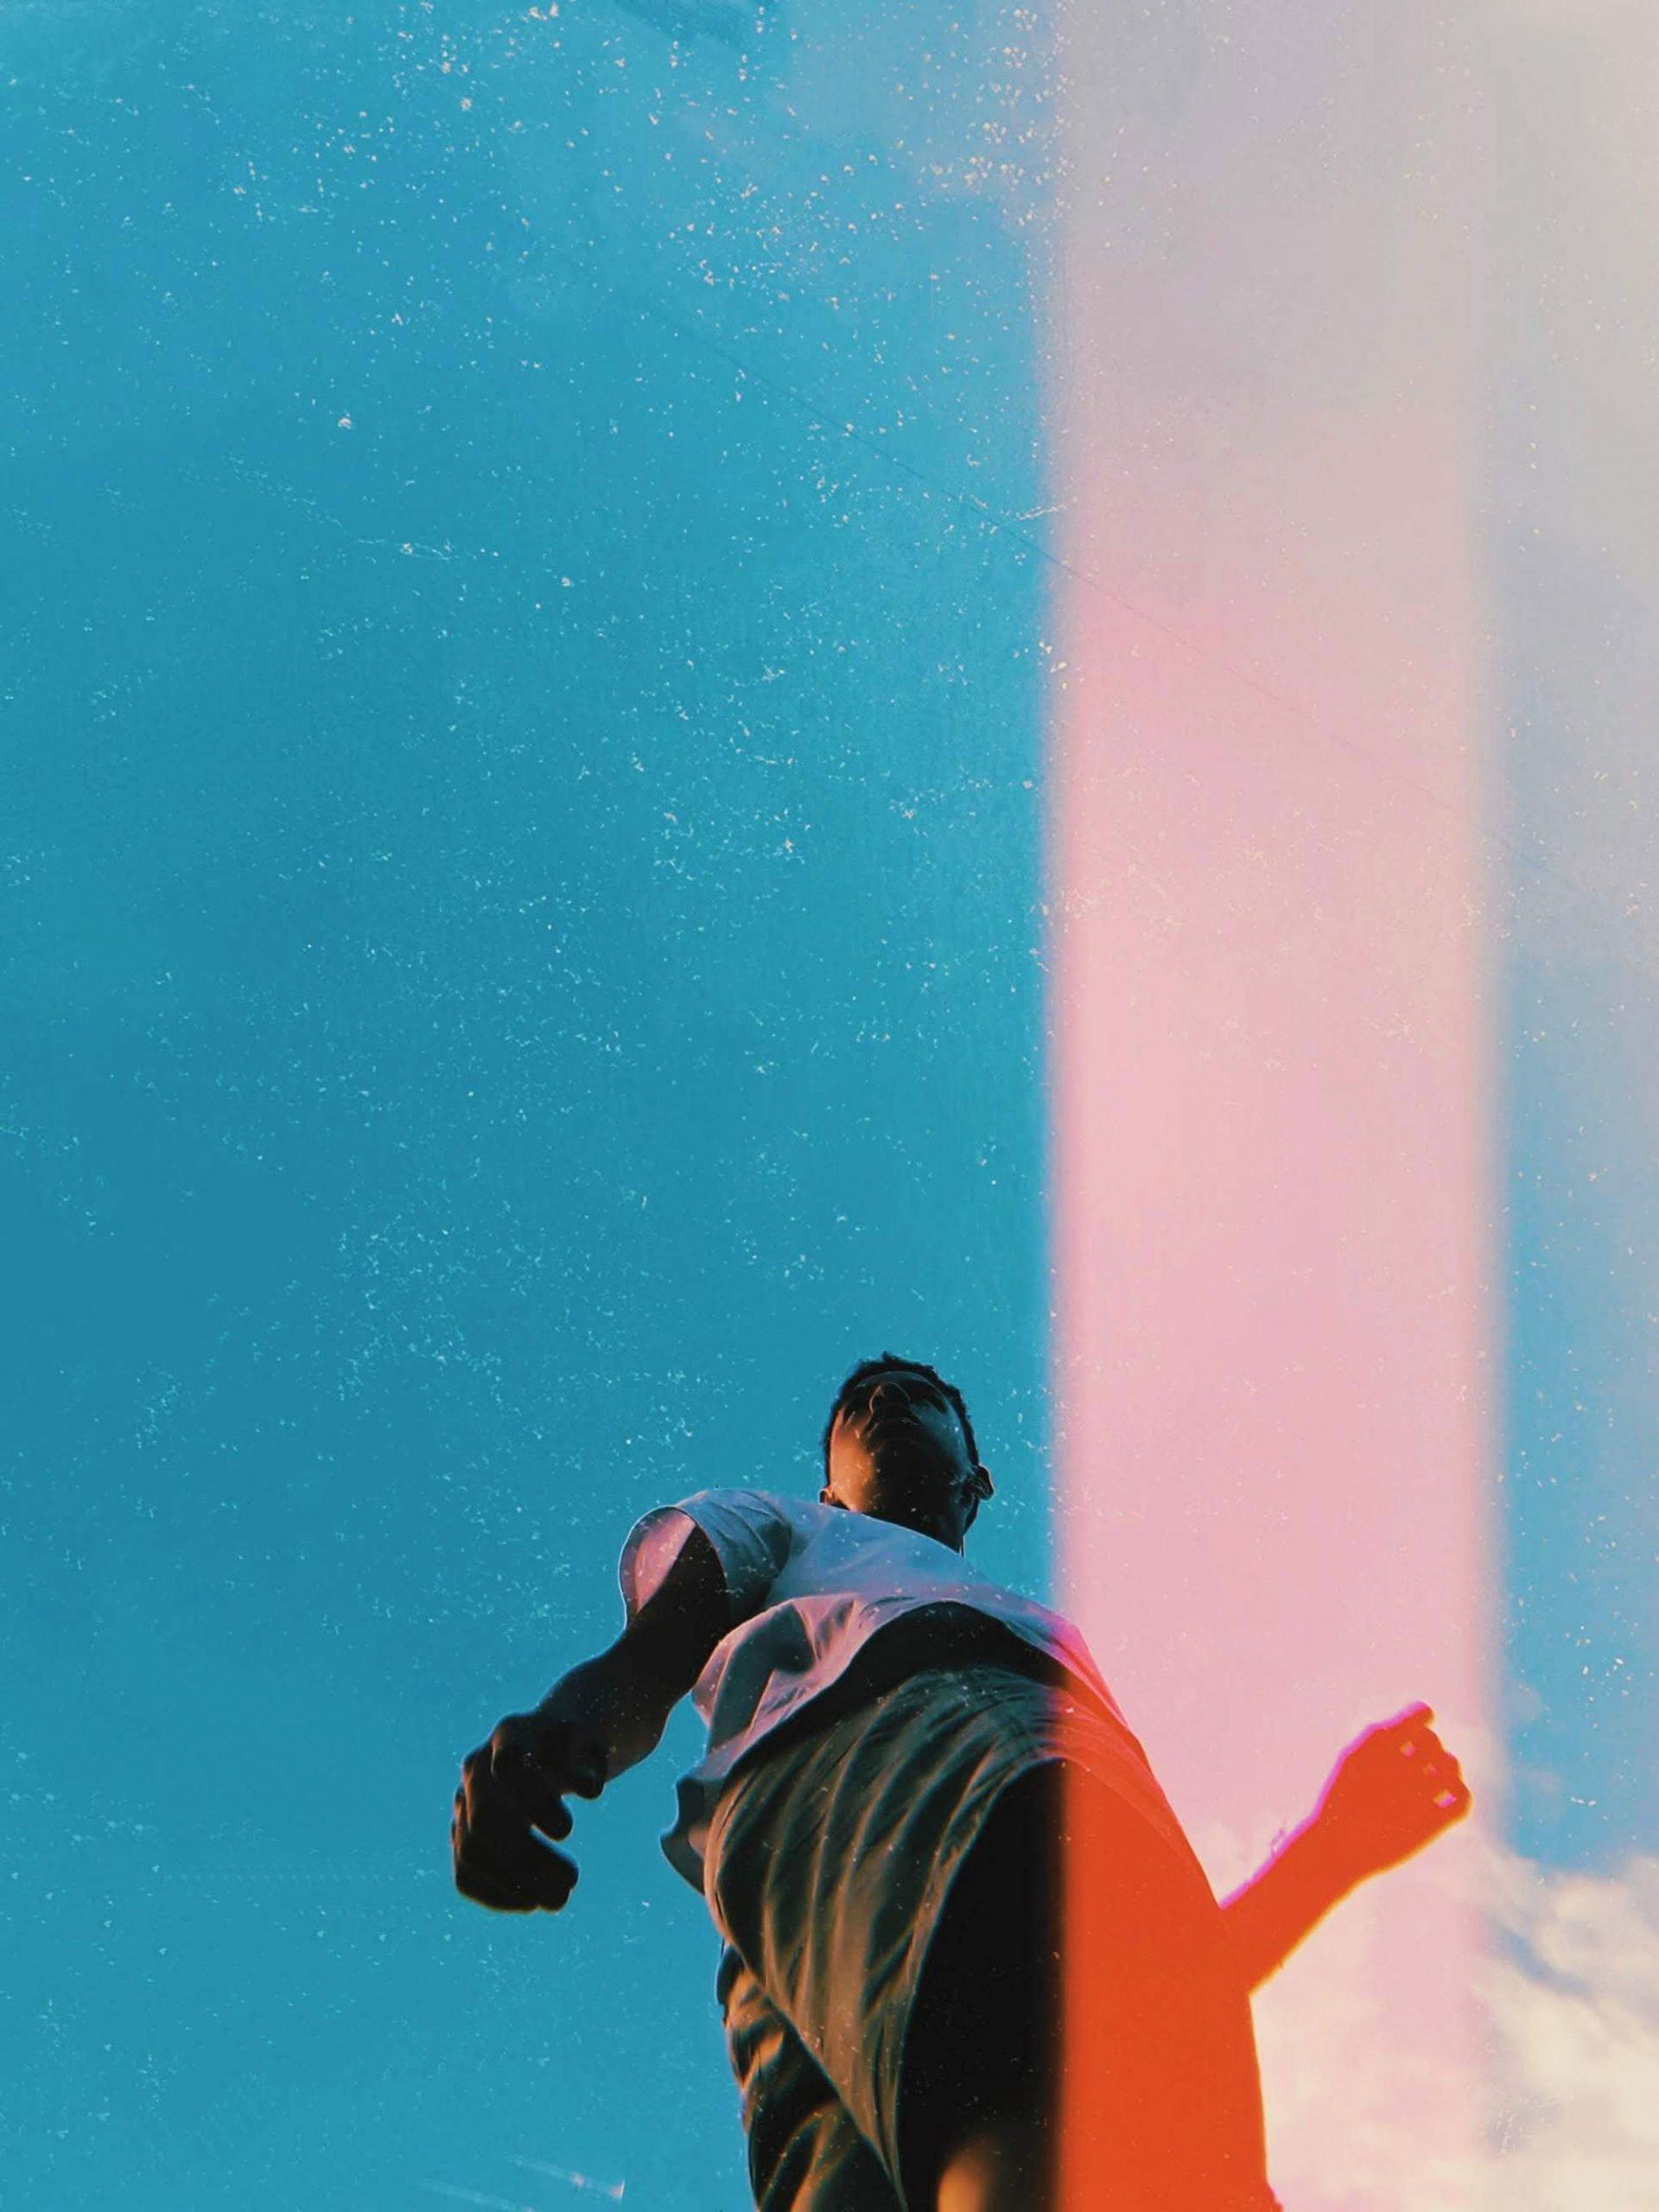 Image of a boy standing was uploaded on kalika.com